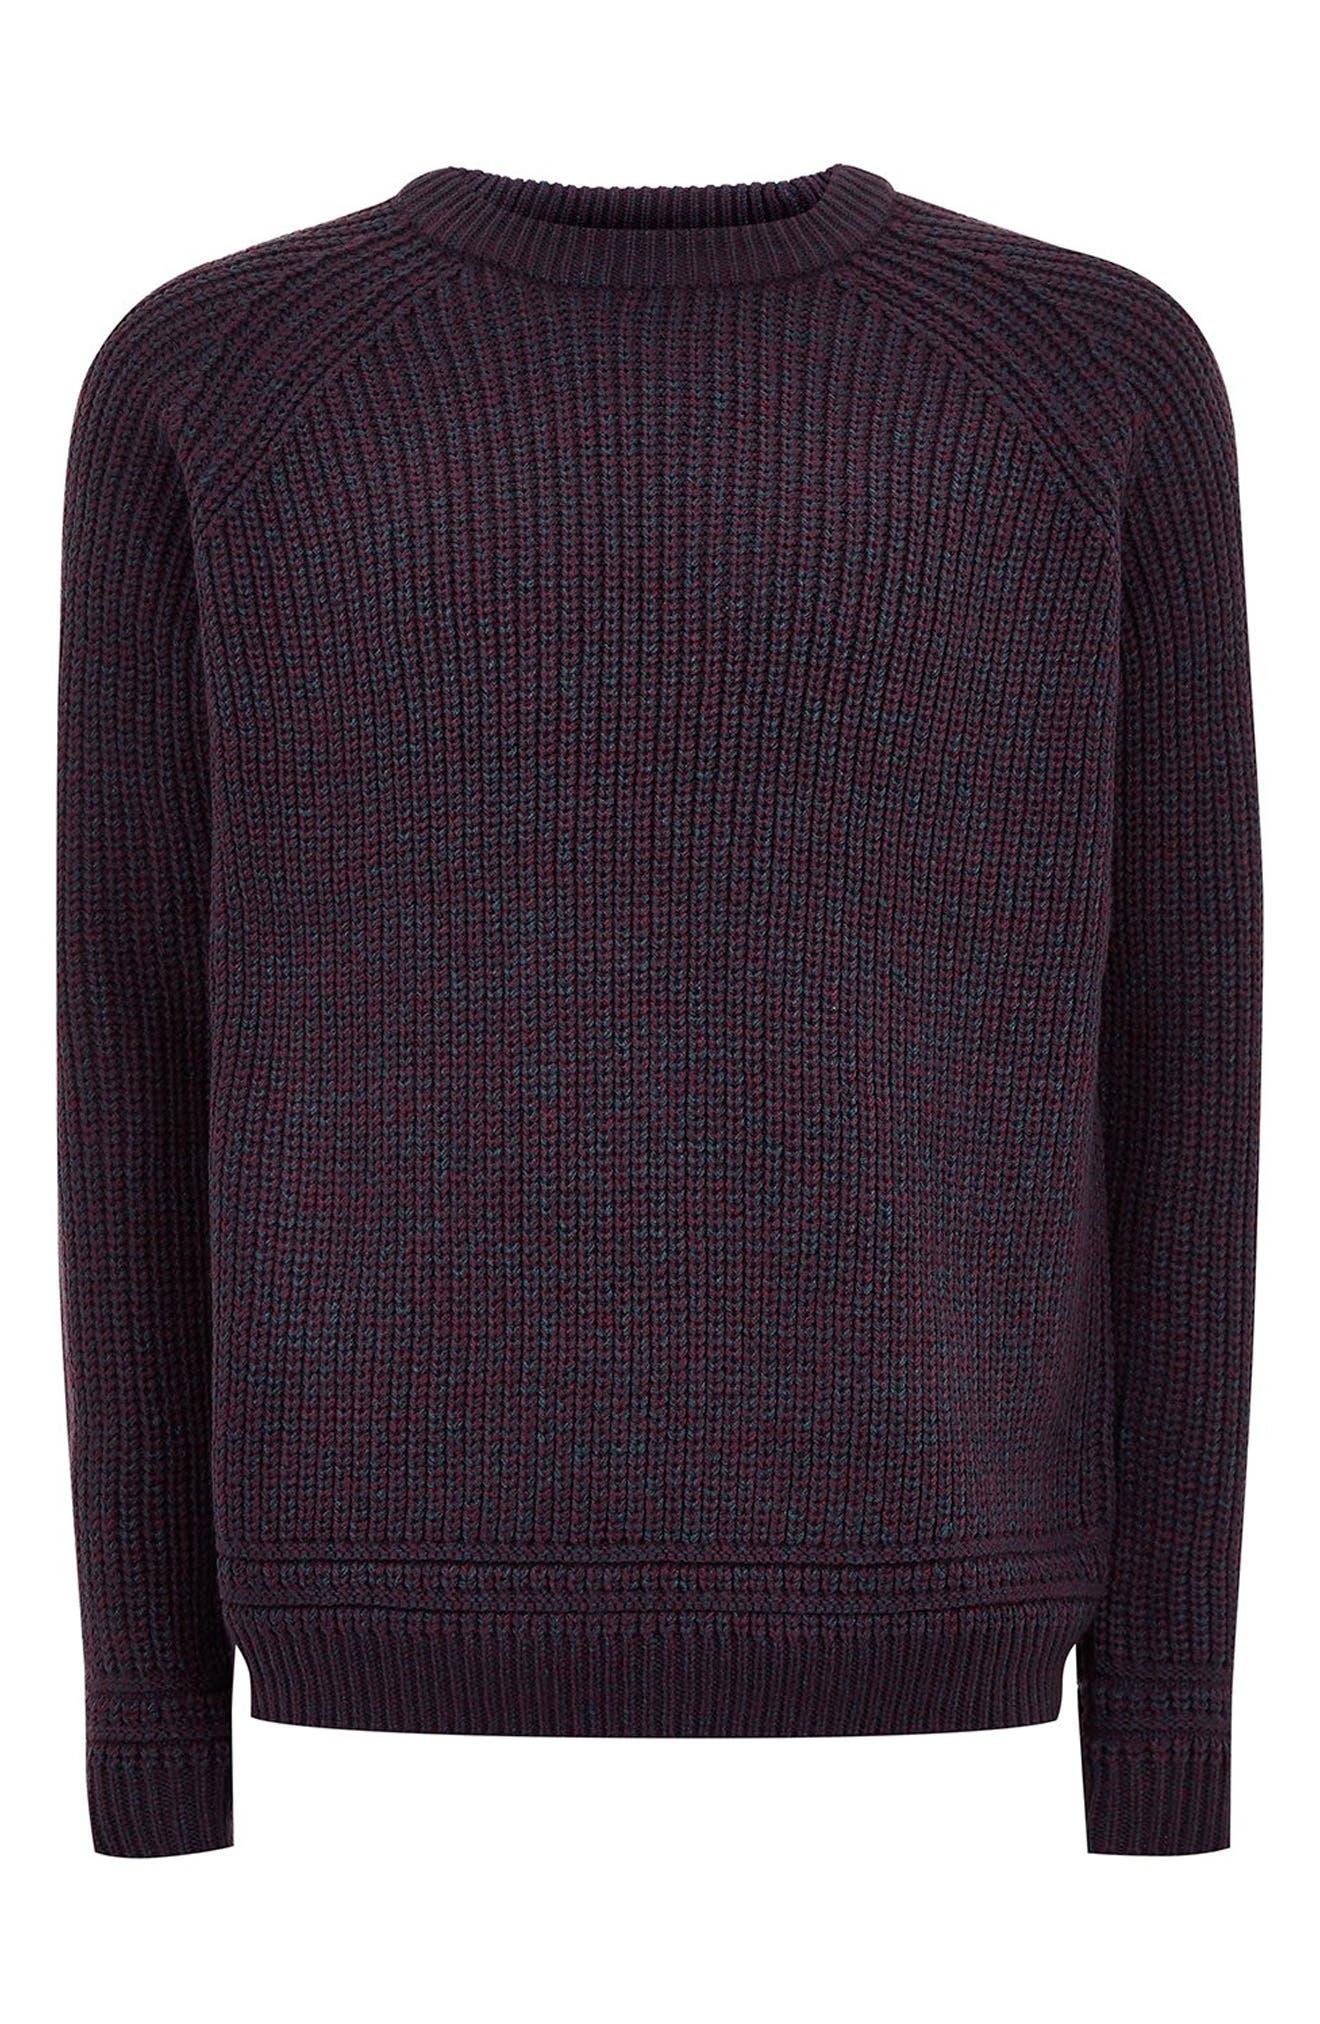 Crewneck Sweater,                             Alternate thumbnail 4, color,                             BURGUNDY MULTI